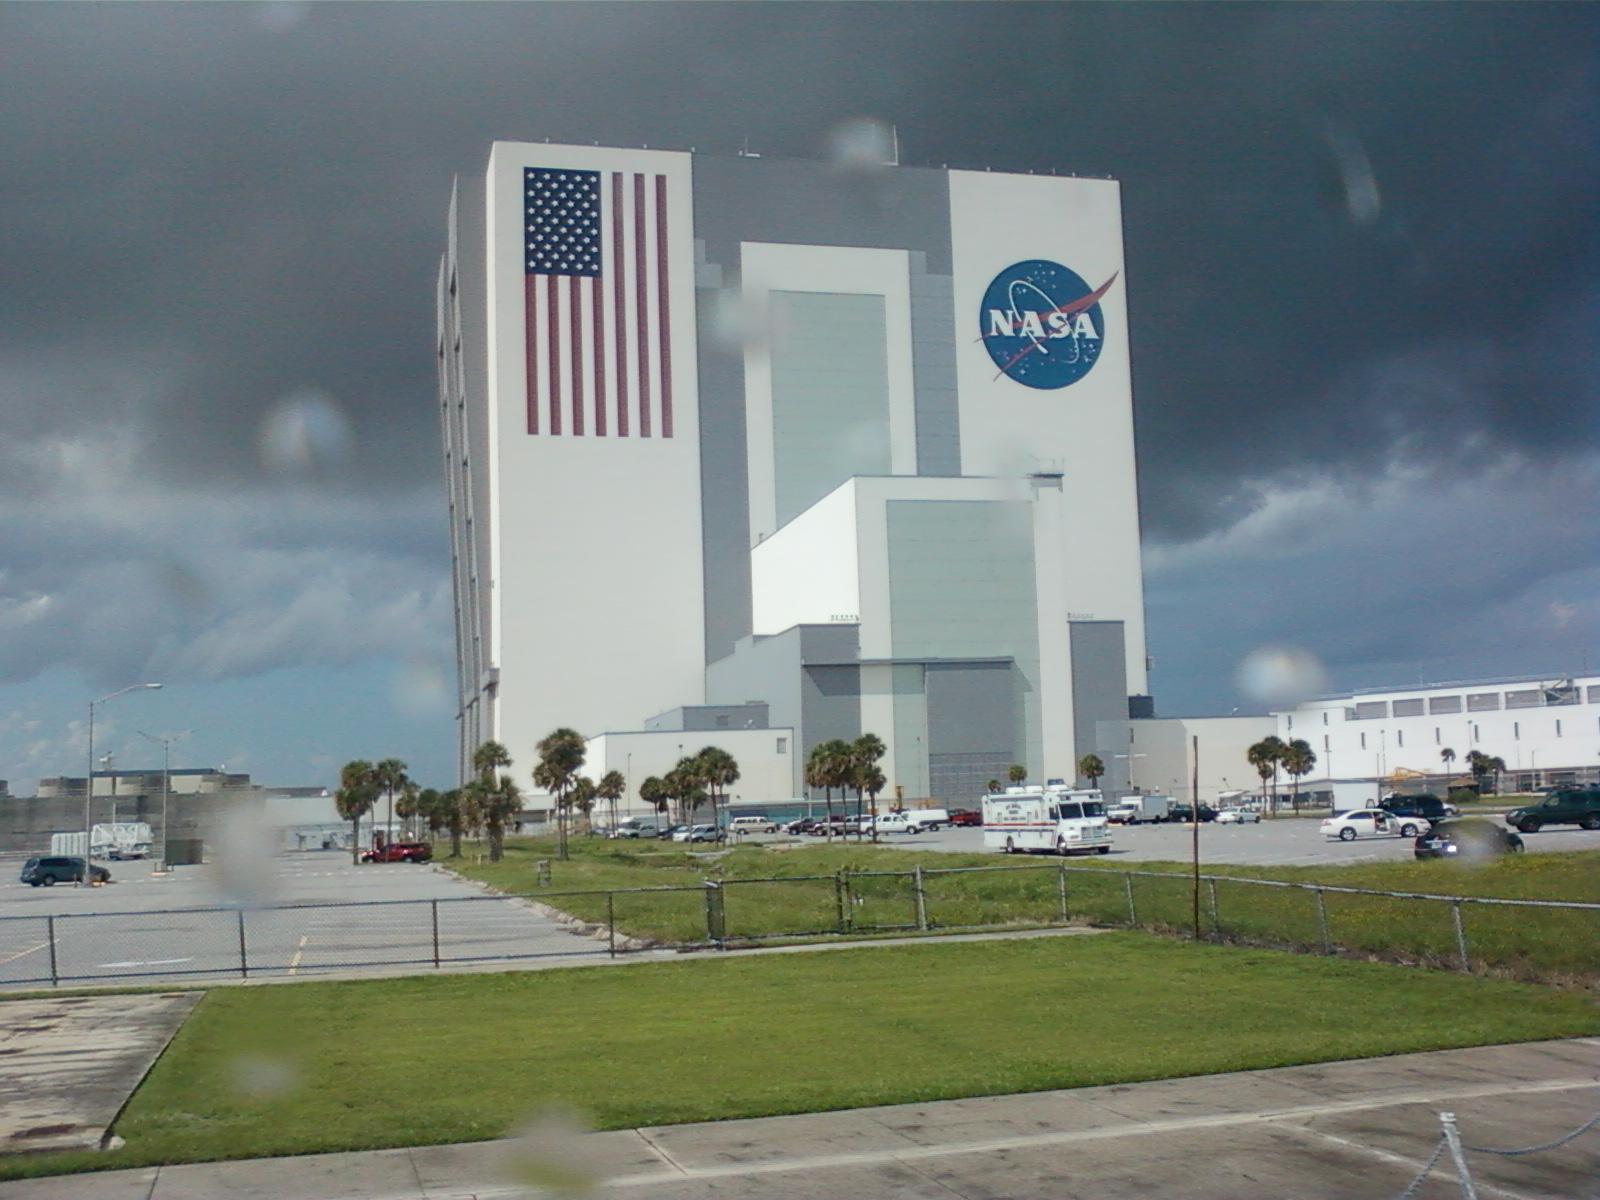 NASA I-STEAM Field Trip – Back by Popular Demand